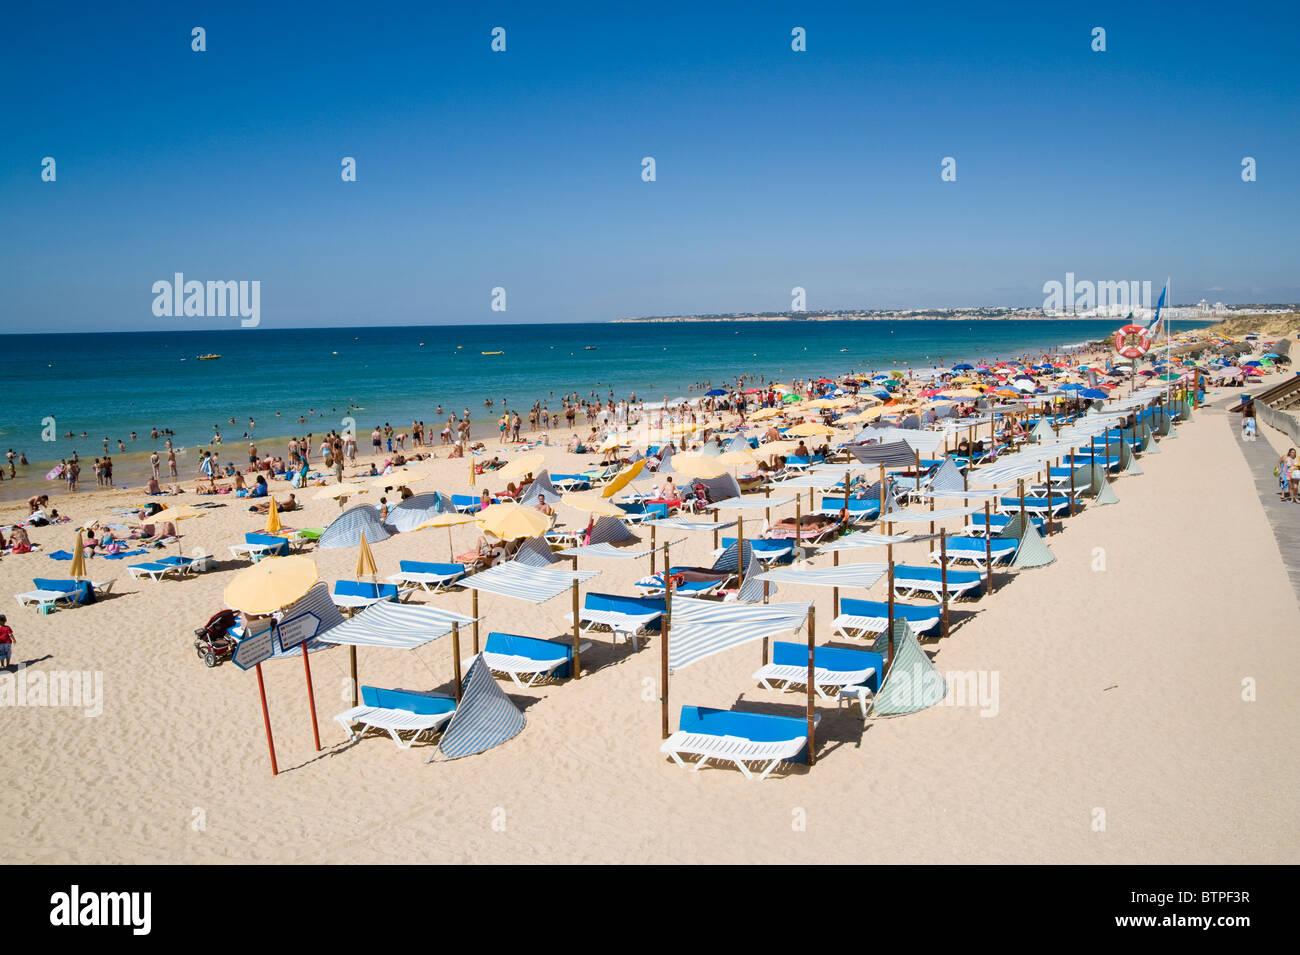 Praia da Gala, Beach, Albuferia, Algarve, Portugal - Stock Image